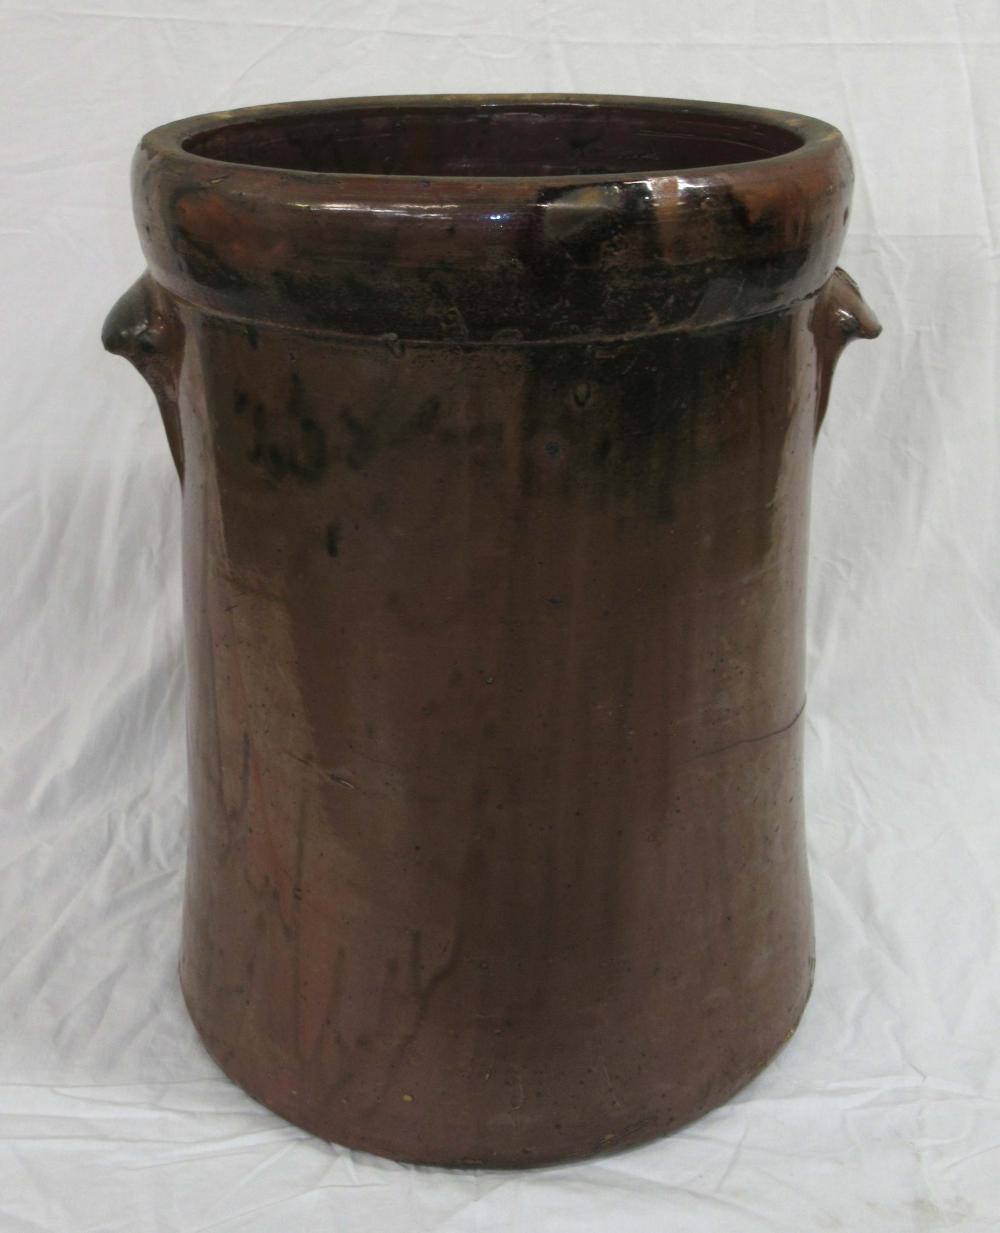 Evans Pottery 10 Gal. Crock